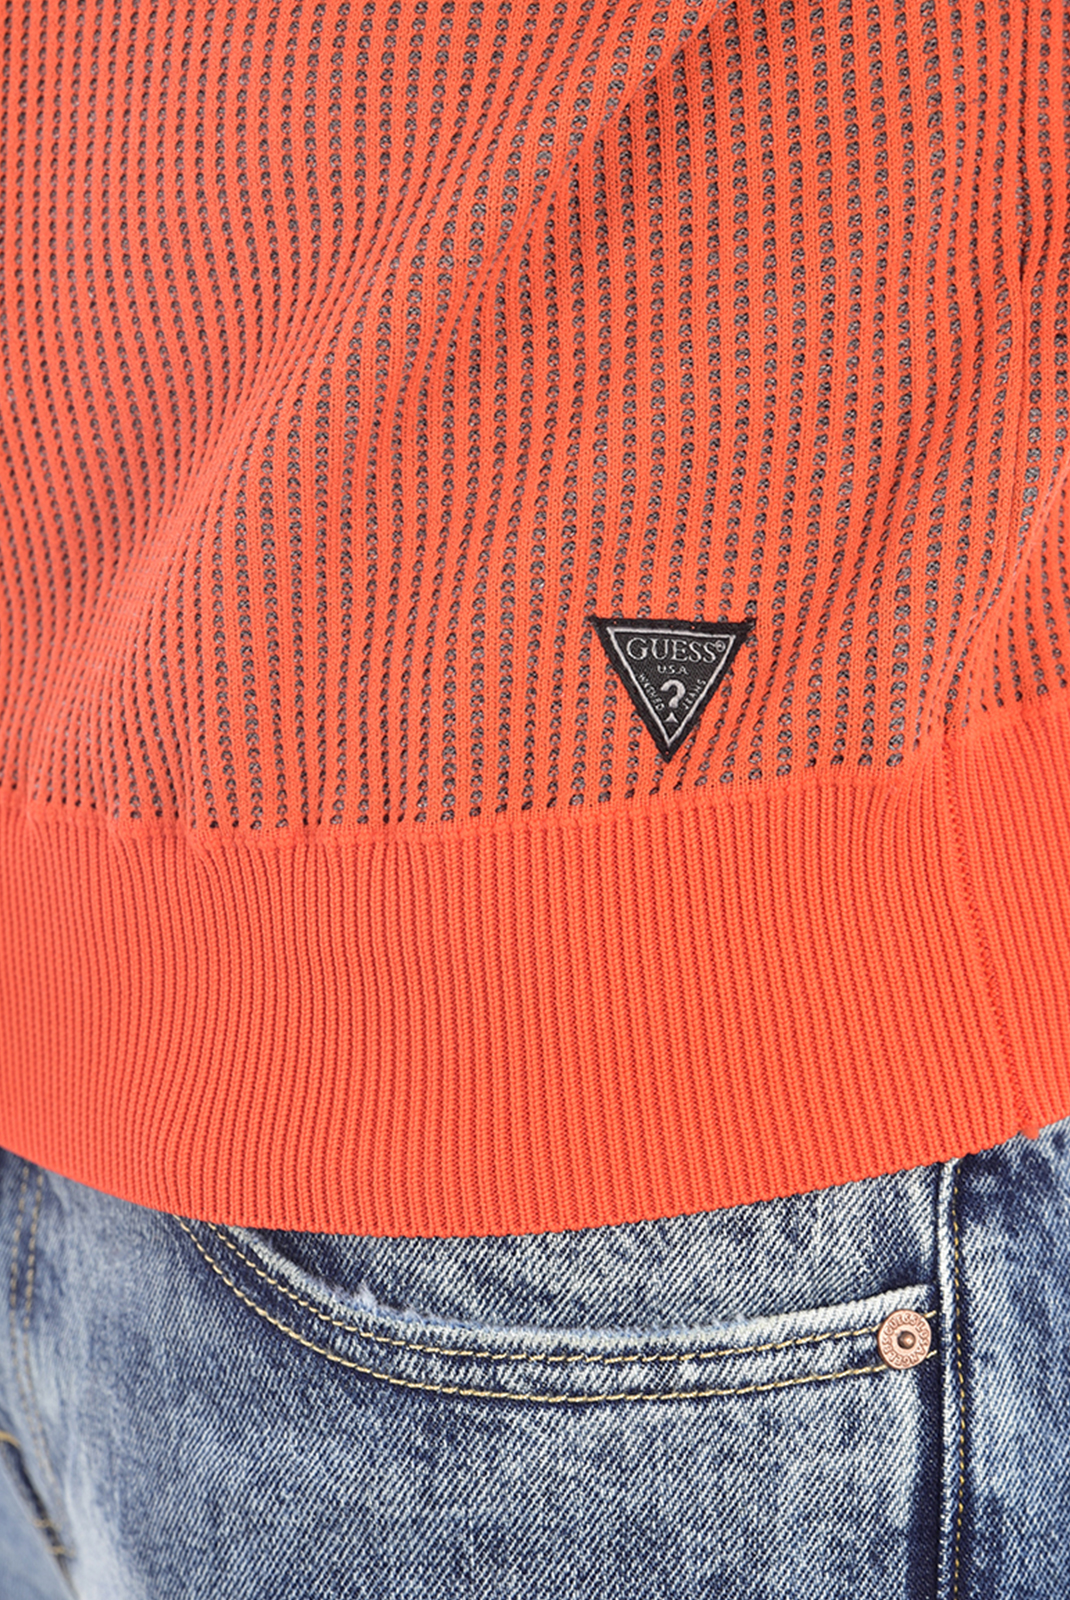 HOMME  Guess jeans U94R01 ZZ03C MNRD ORANGE